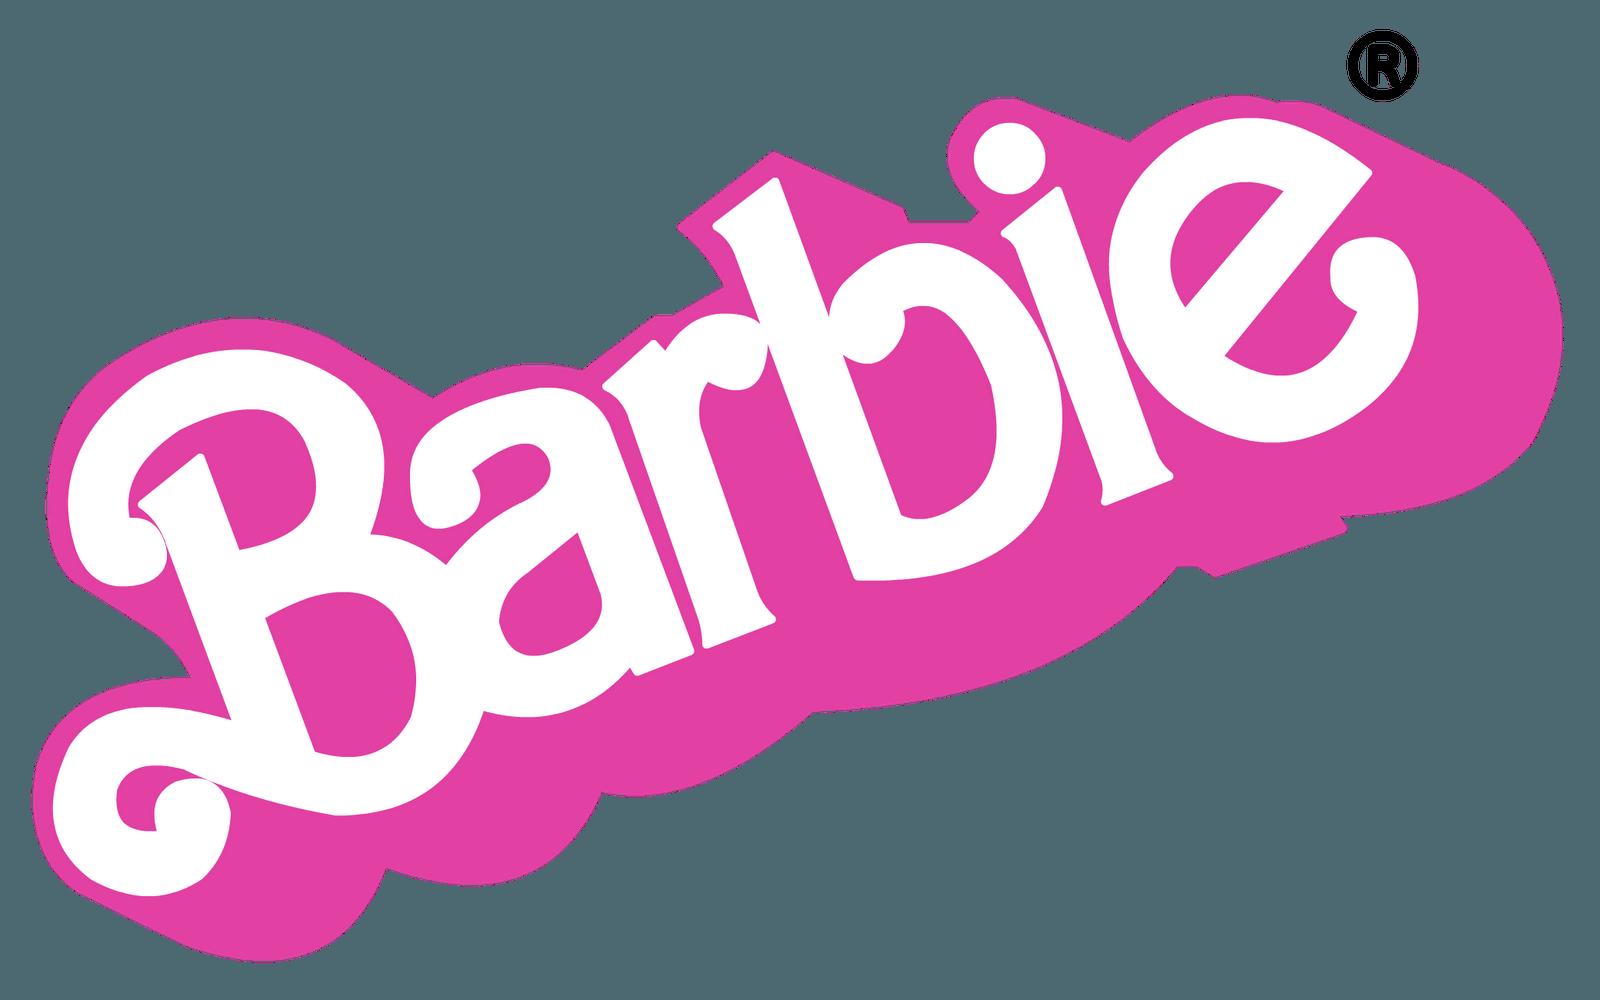 Barbie Logo Wallpapers - Wallpaper Cave